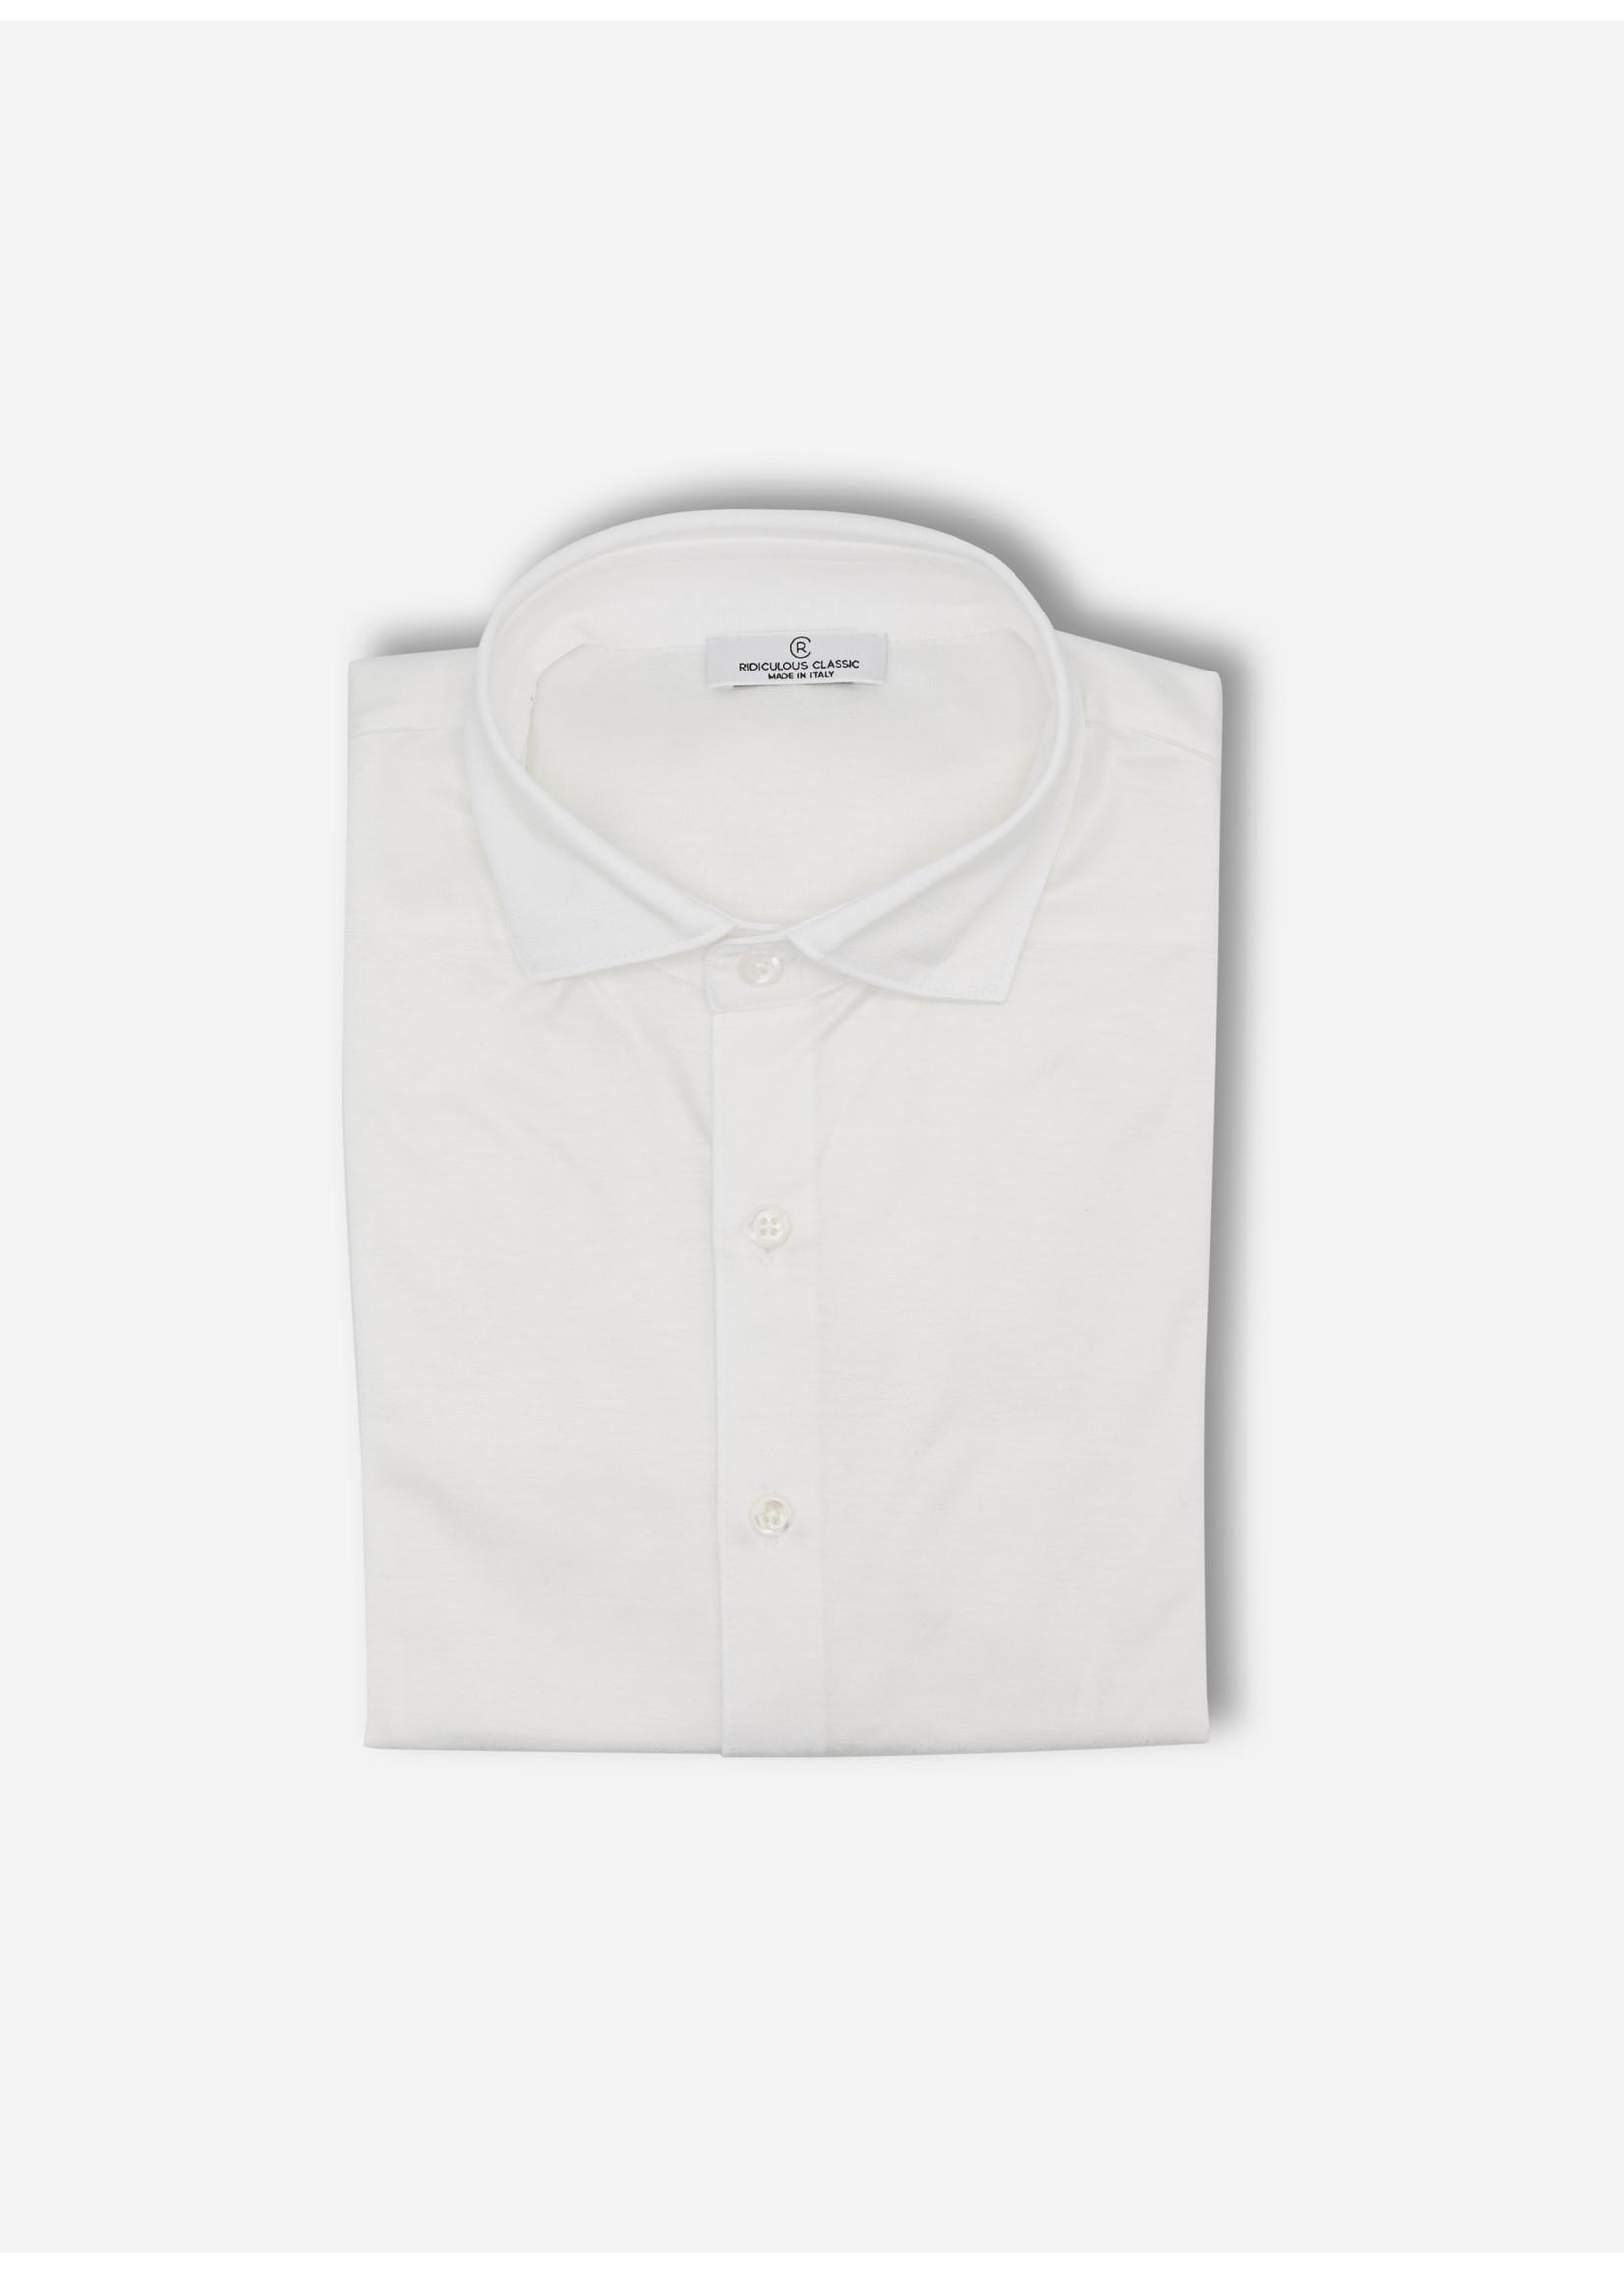 Ridiculous Classic Shirt white